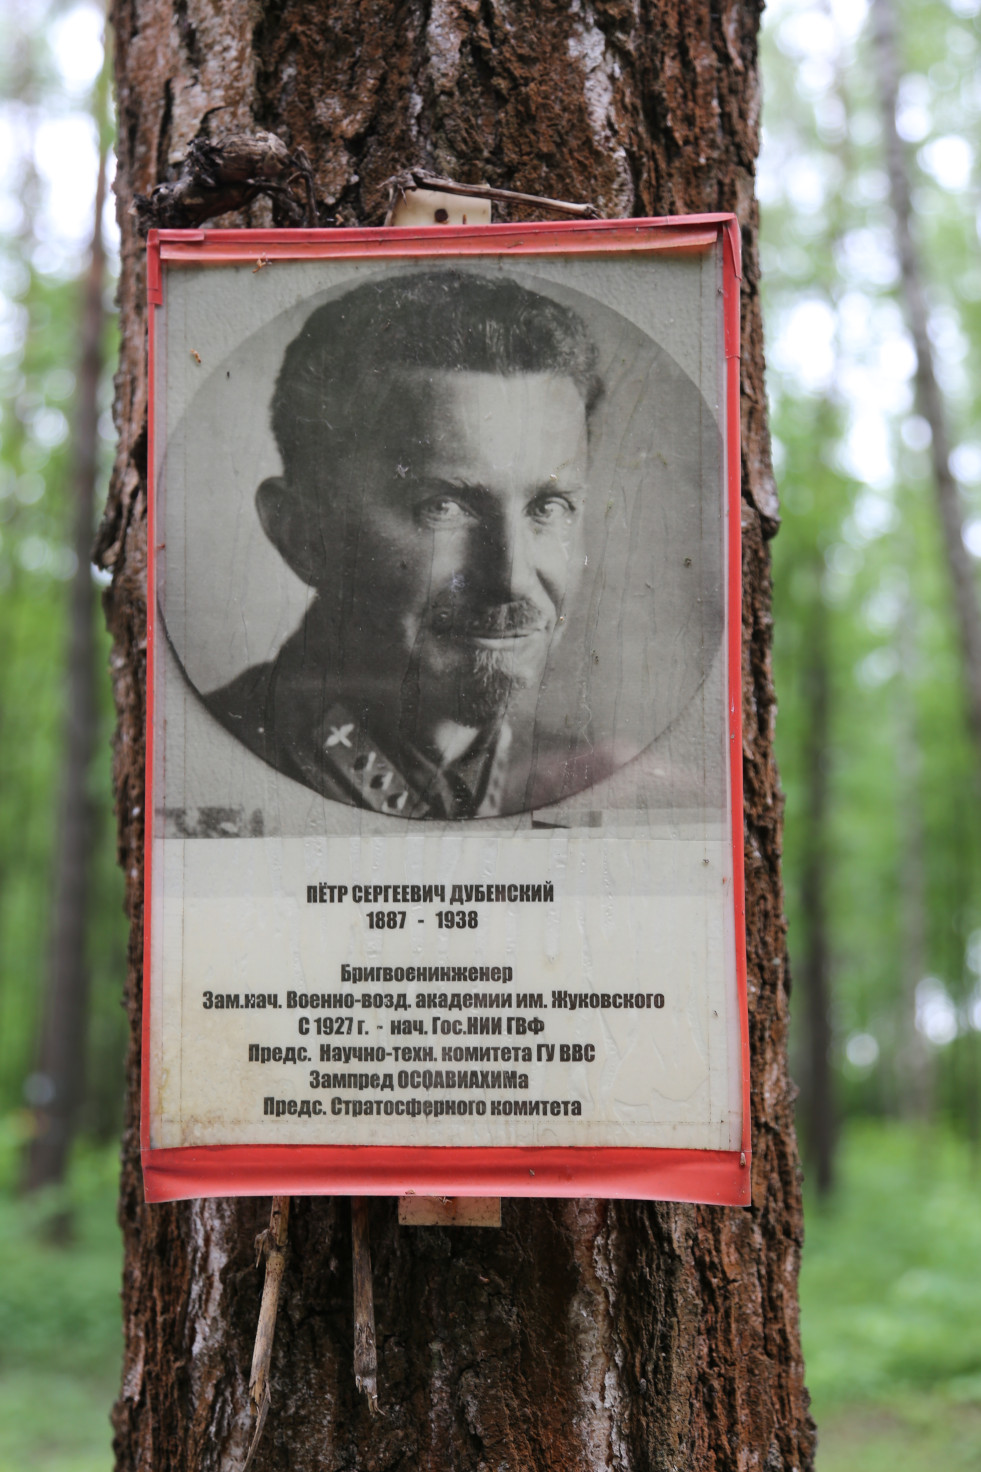 Памятная табличка П.С. Дубенскому. Фото 07.06.2018.